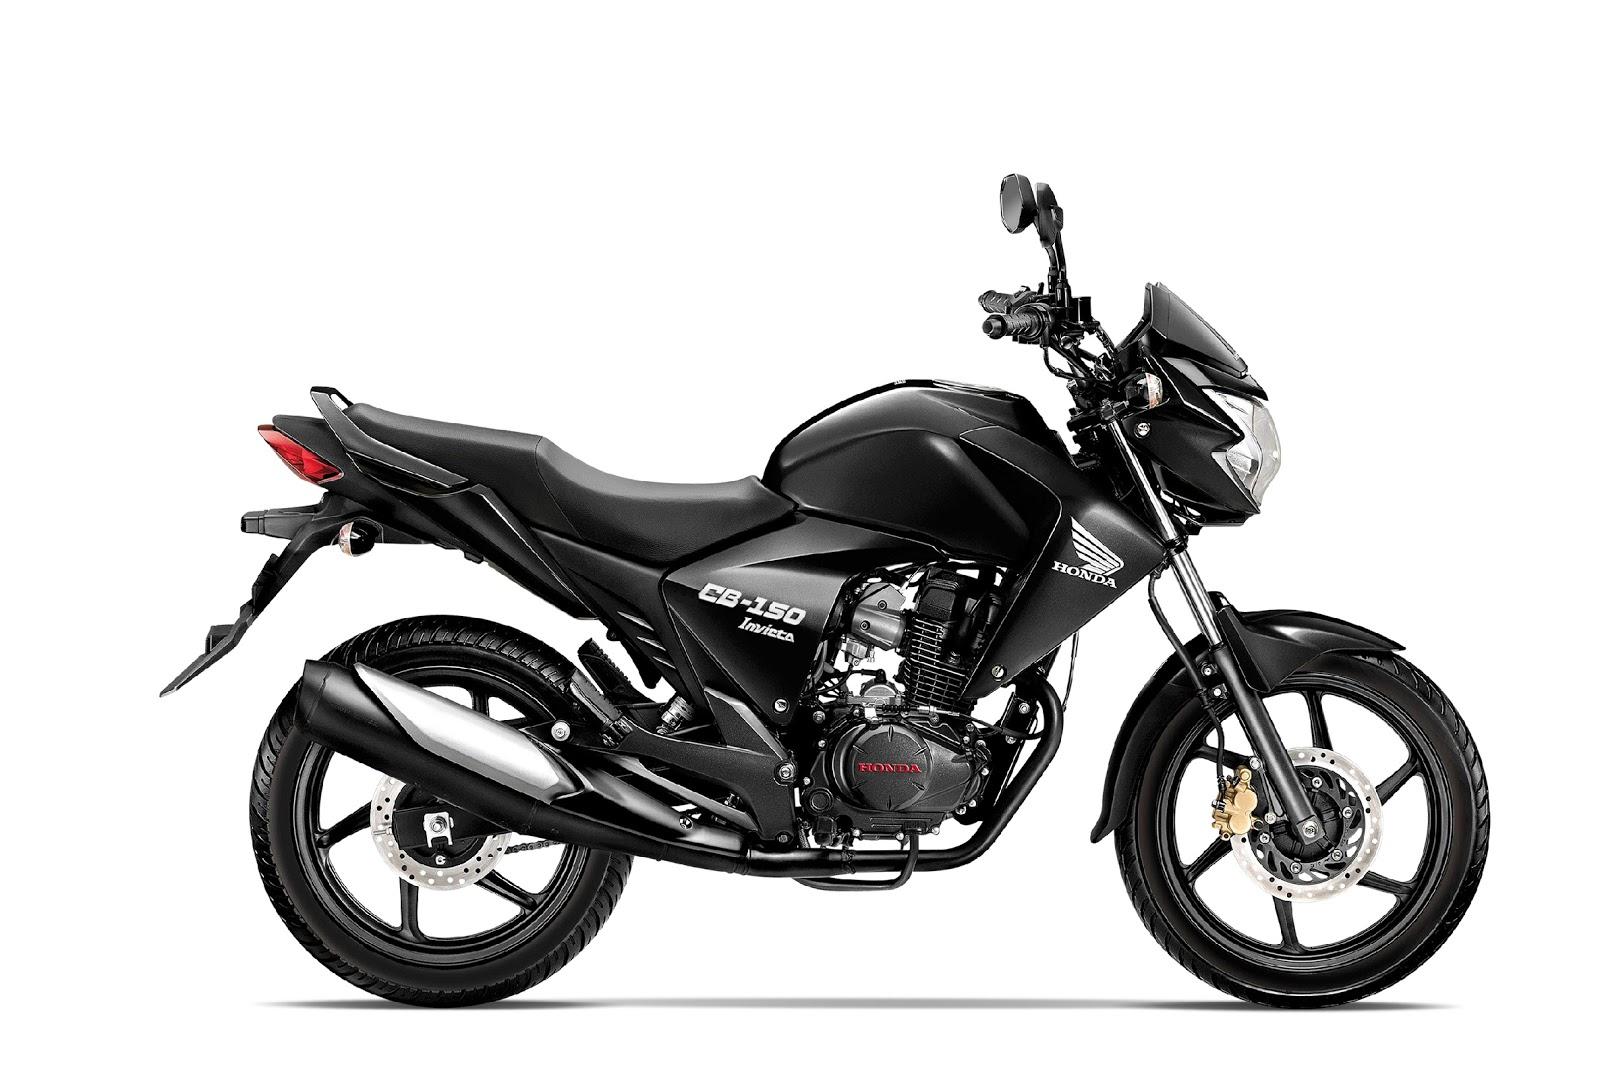 Modelo en color negro de la CB 150 Invicta de Honda